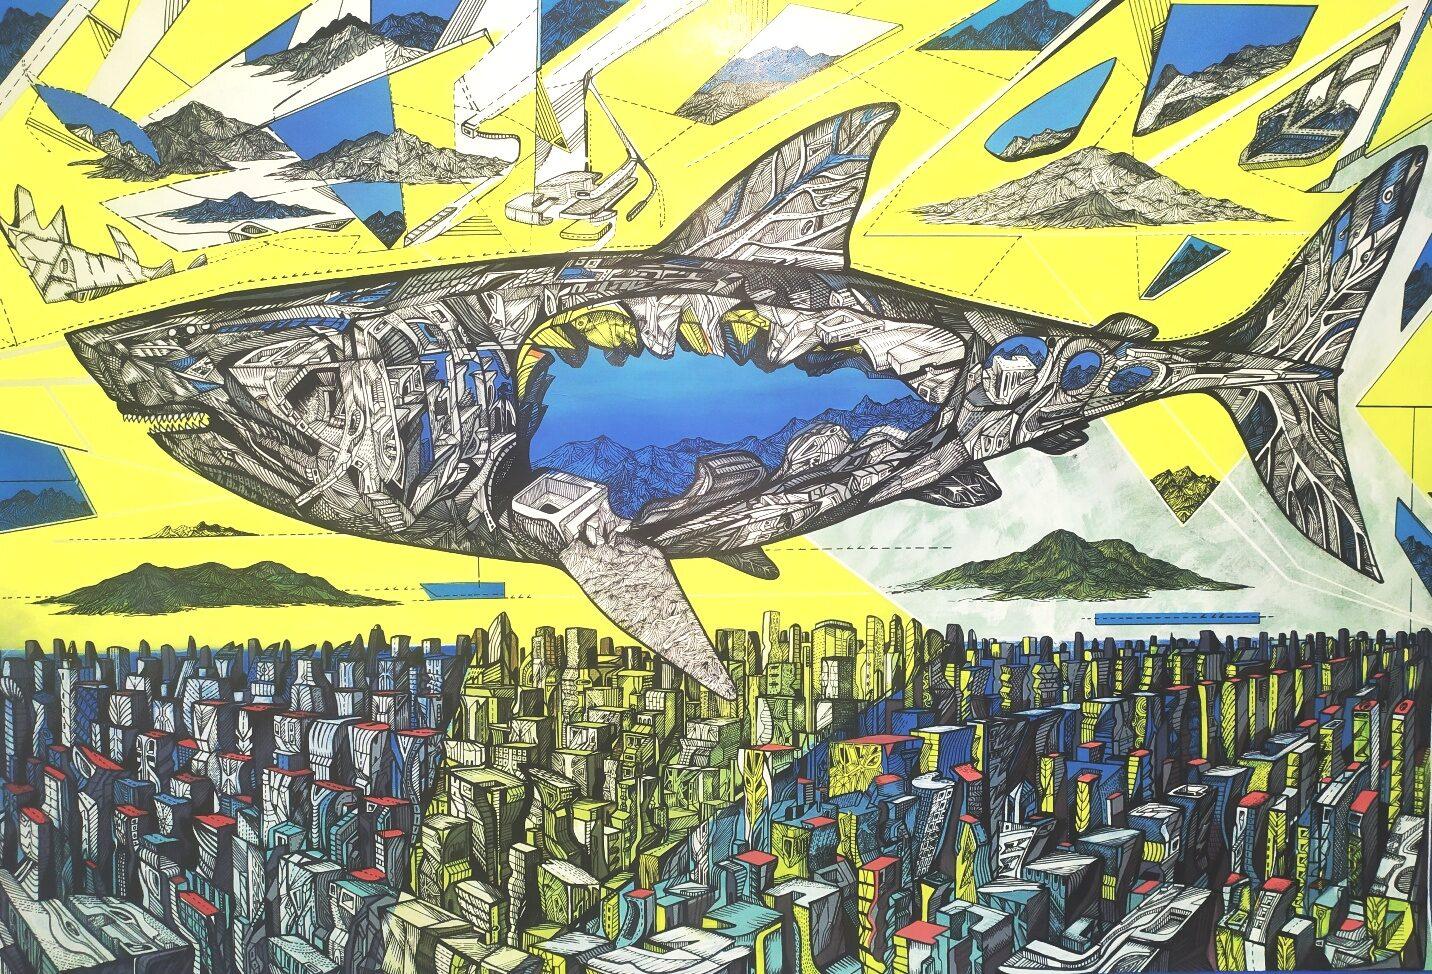 The Endless sea inside, 104 x 153 x 4 cm, acrylic on canvas, 2020 by Marko Gavrilovic